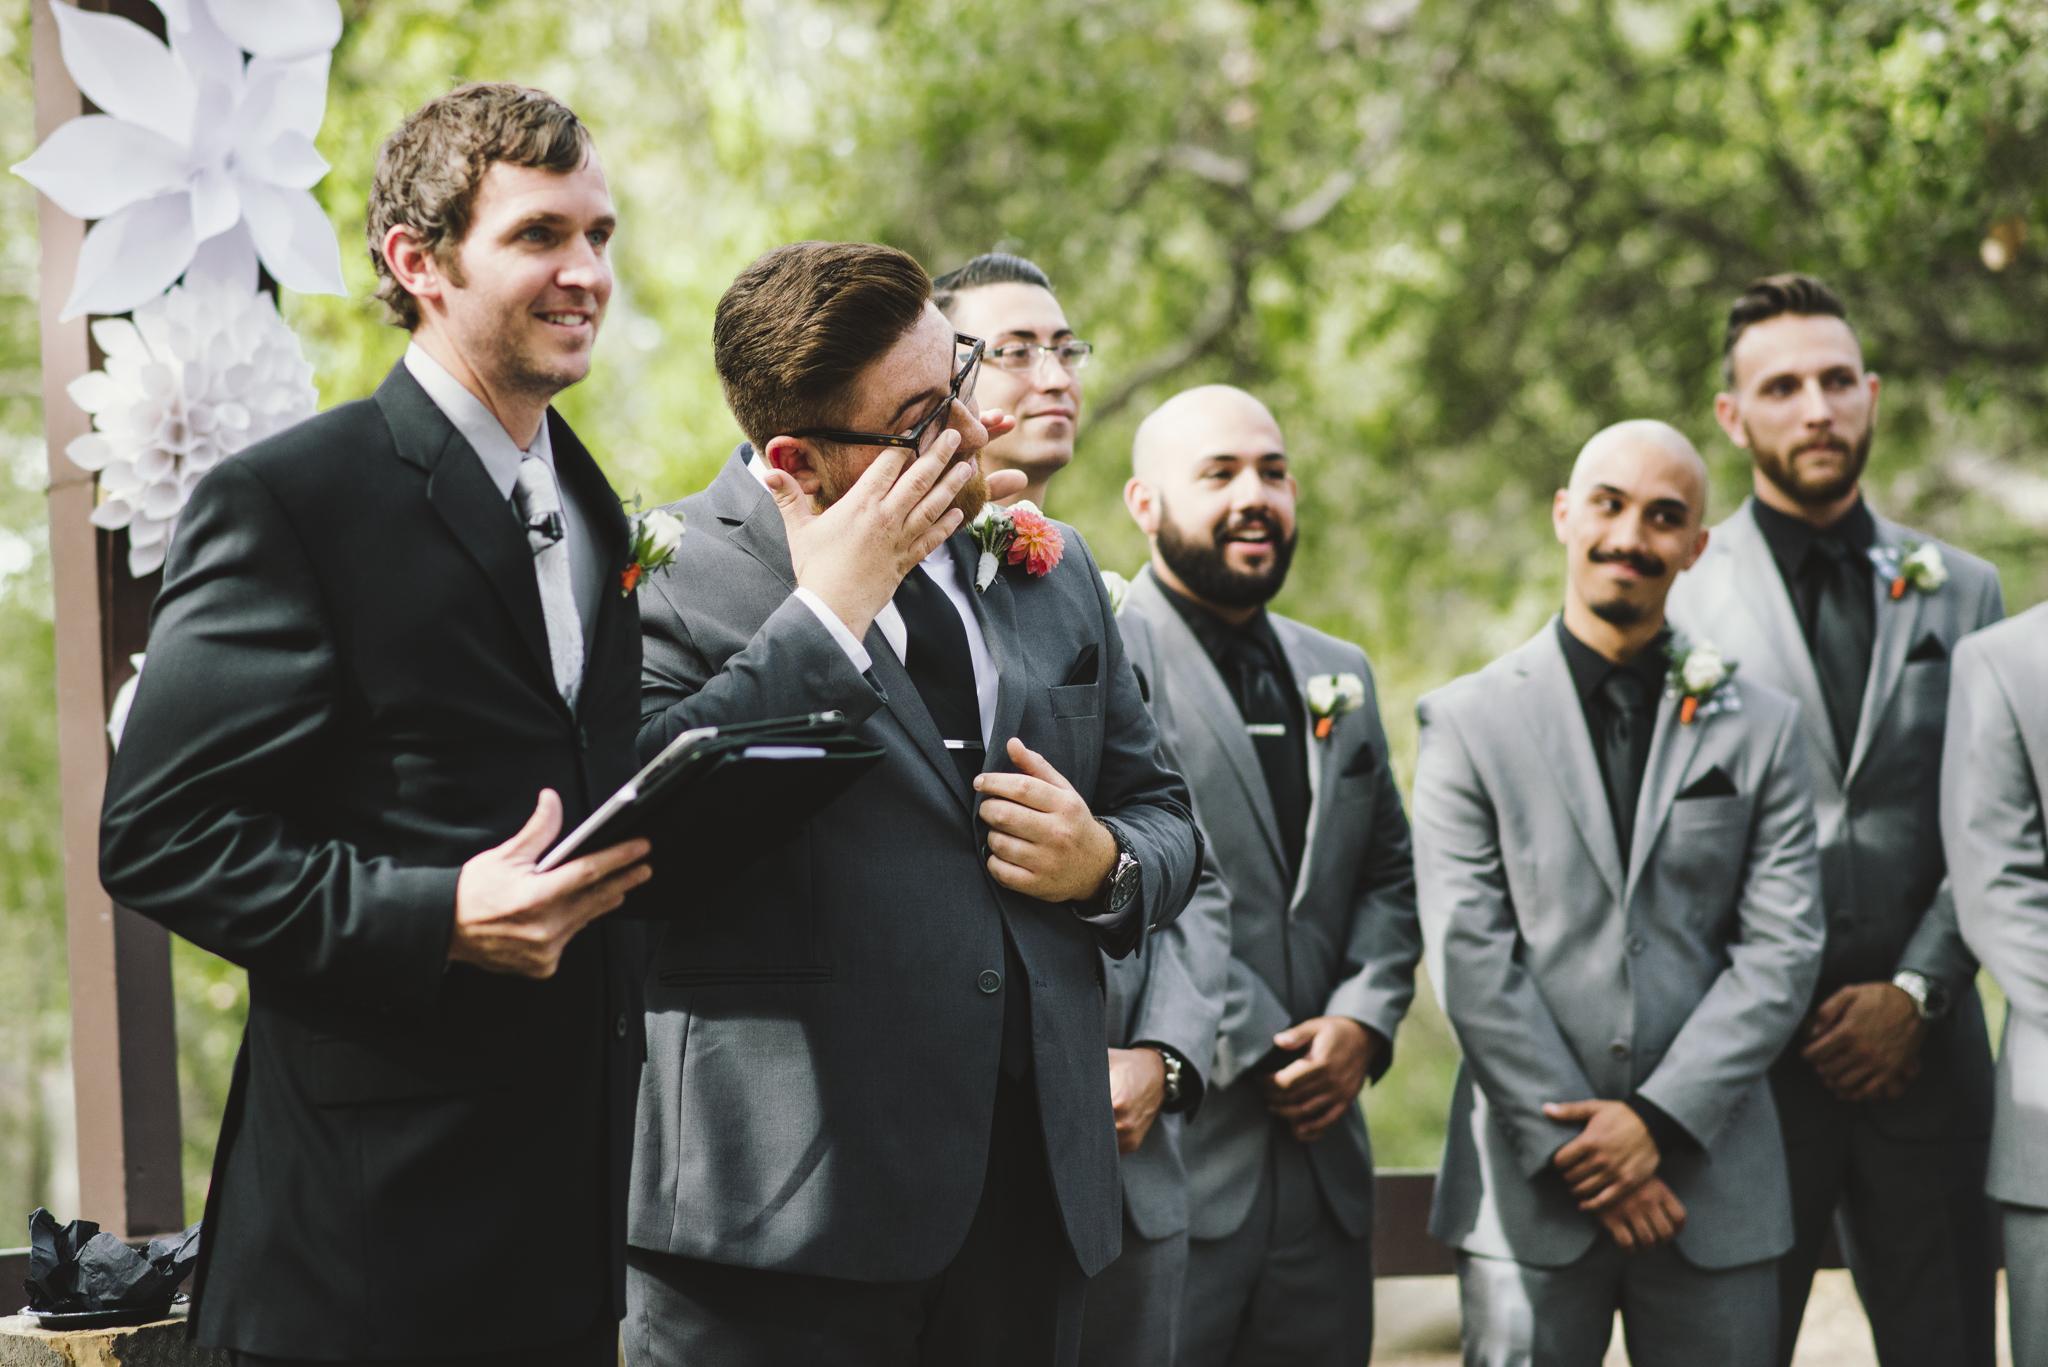 Isaiah & Taylor Photography - Los Angeles Lifestyle Wedding Photographer-10.jpg